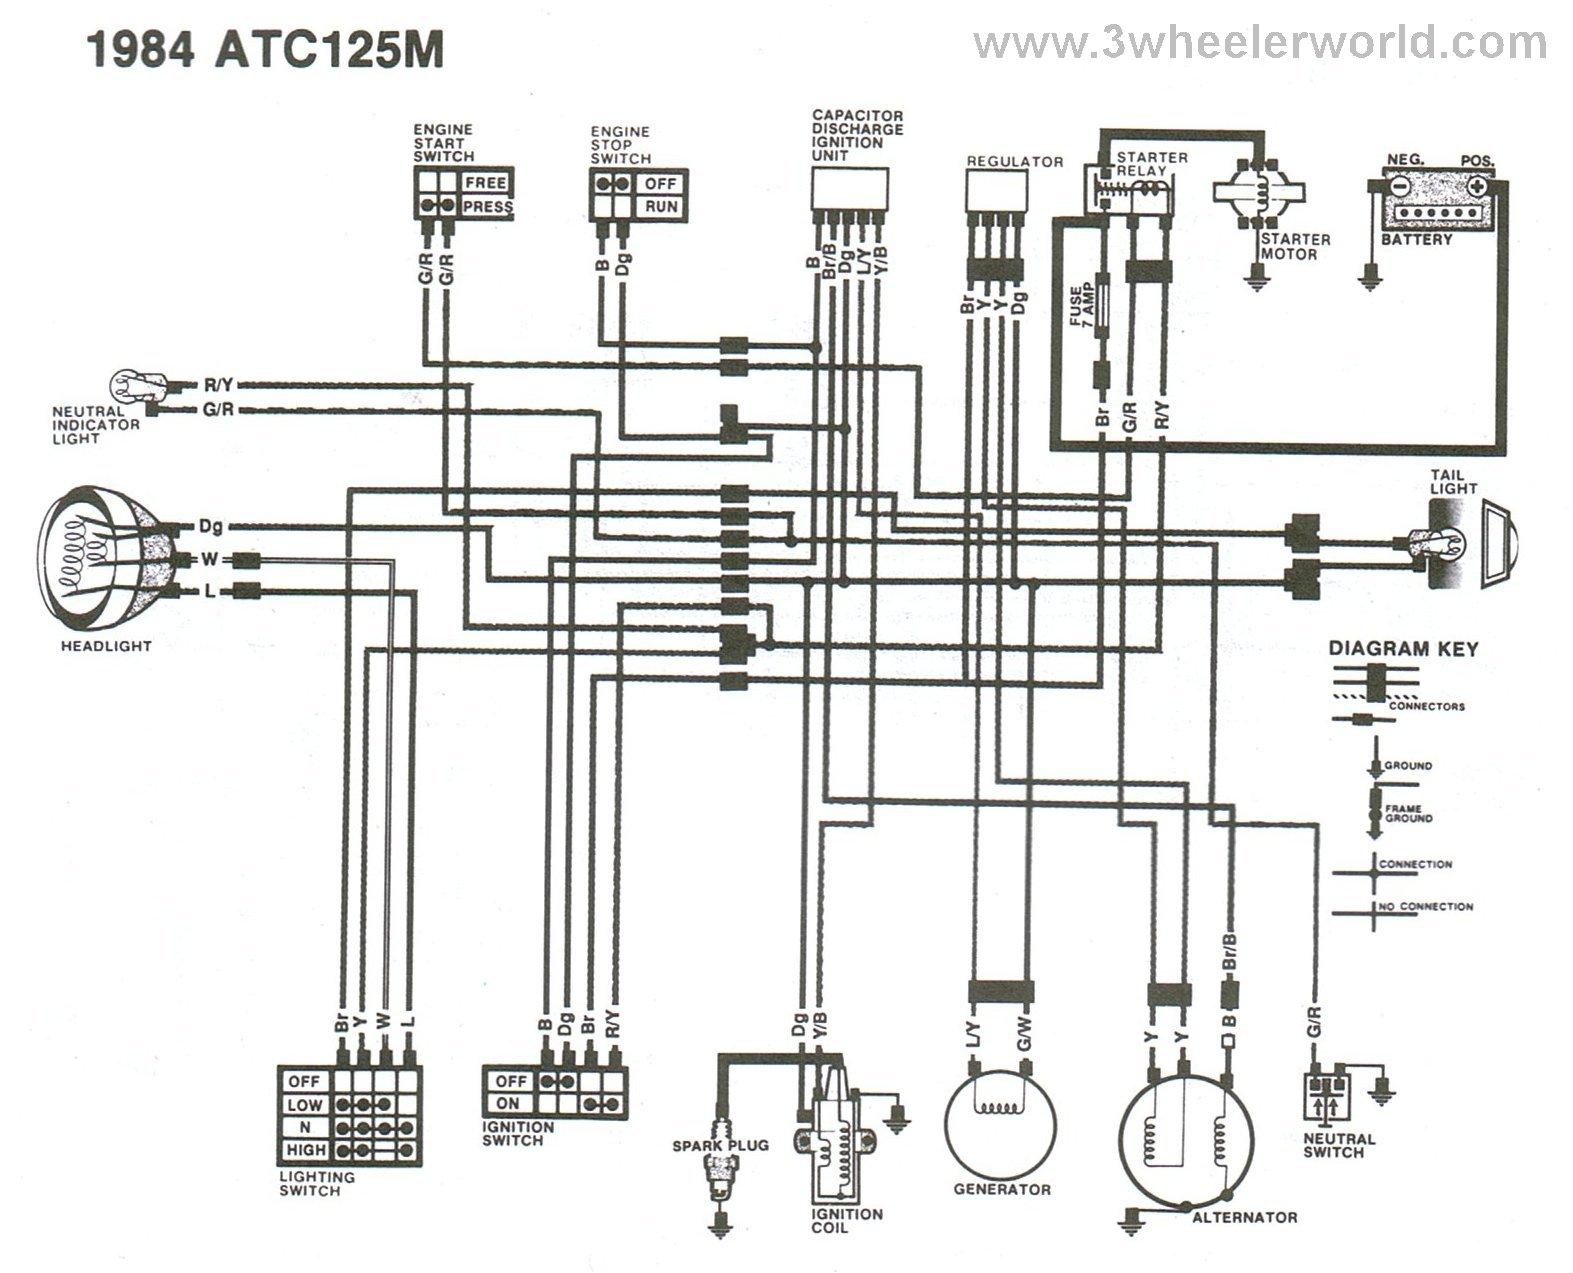 1984 Honda Wiring Diagram List Of Schematic Circuit 1982 Goldwing Jeep Scrambler Viewmotorjdi Org Rh 200m